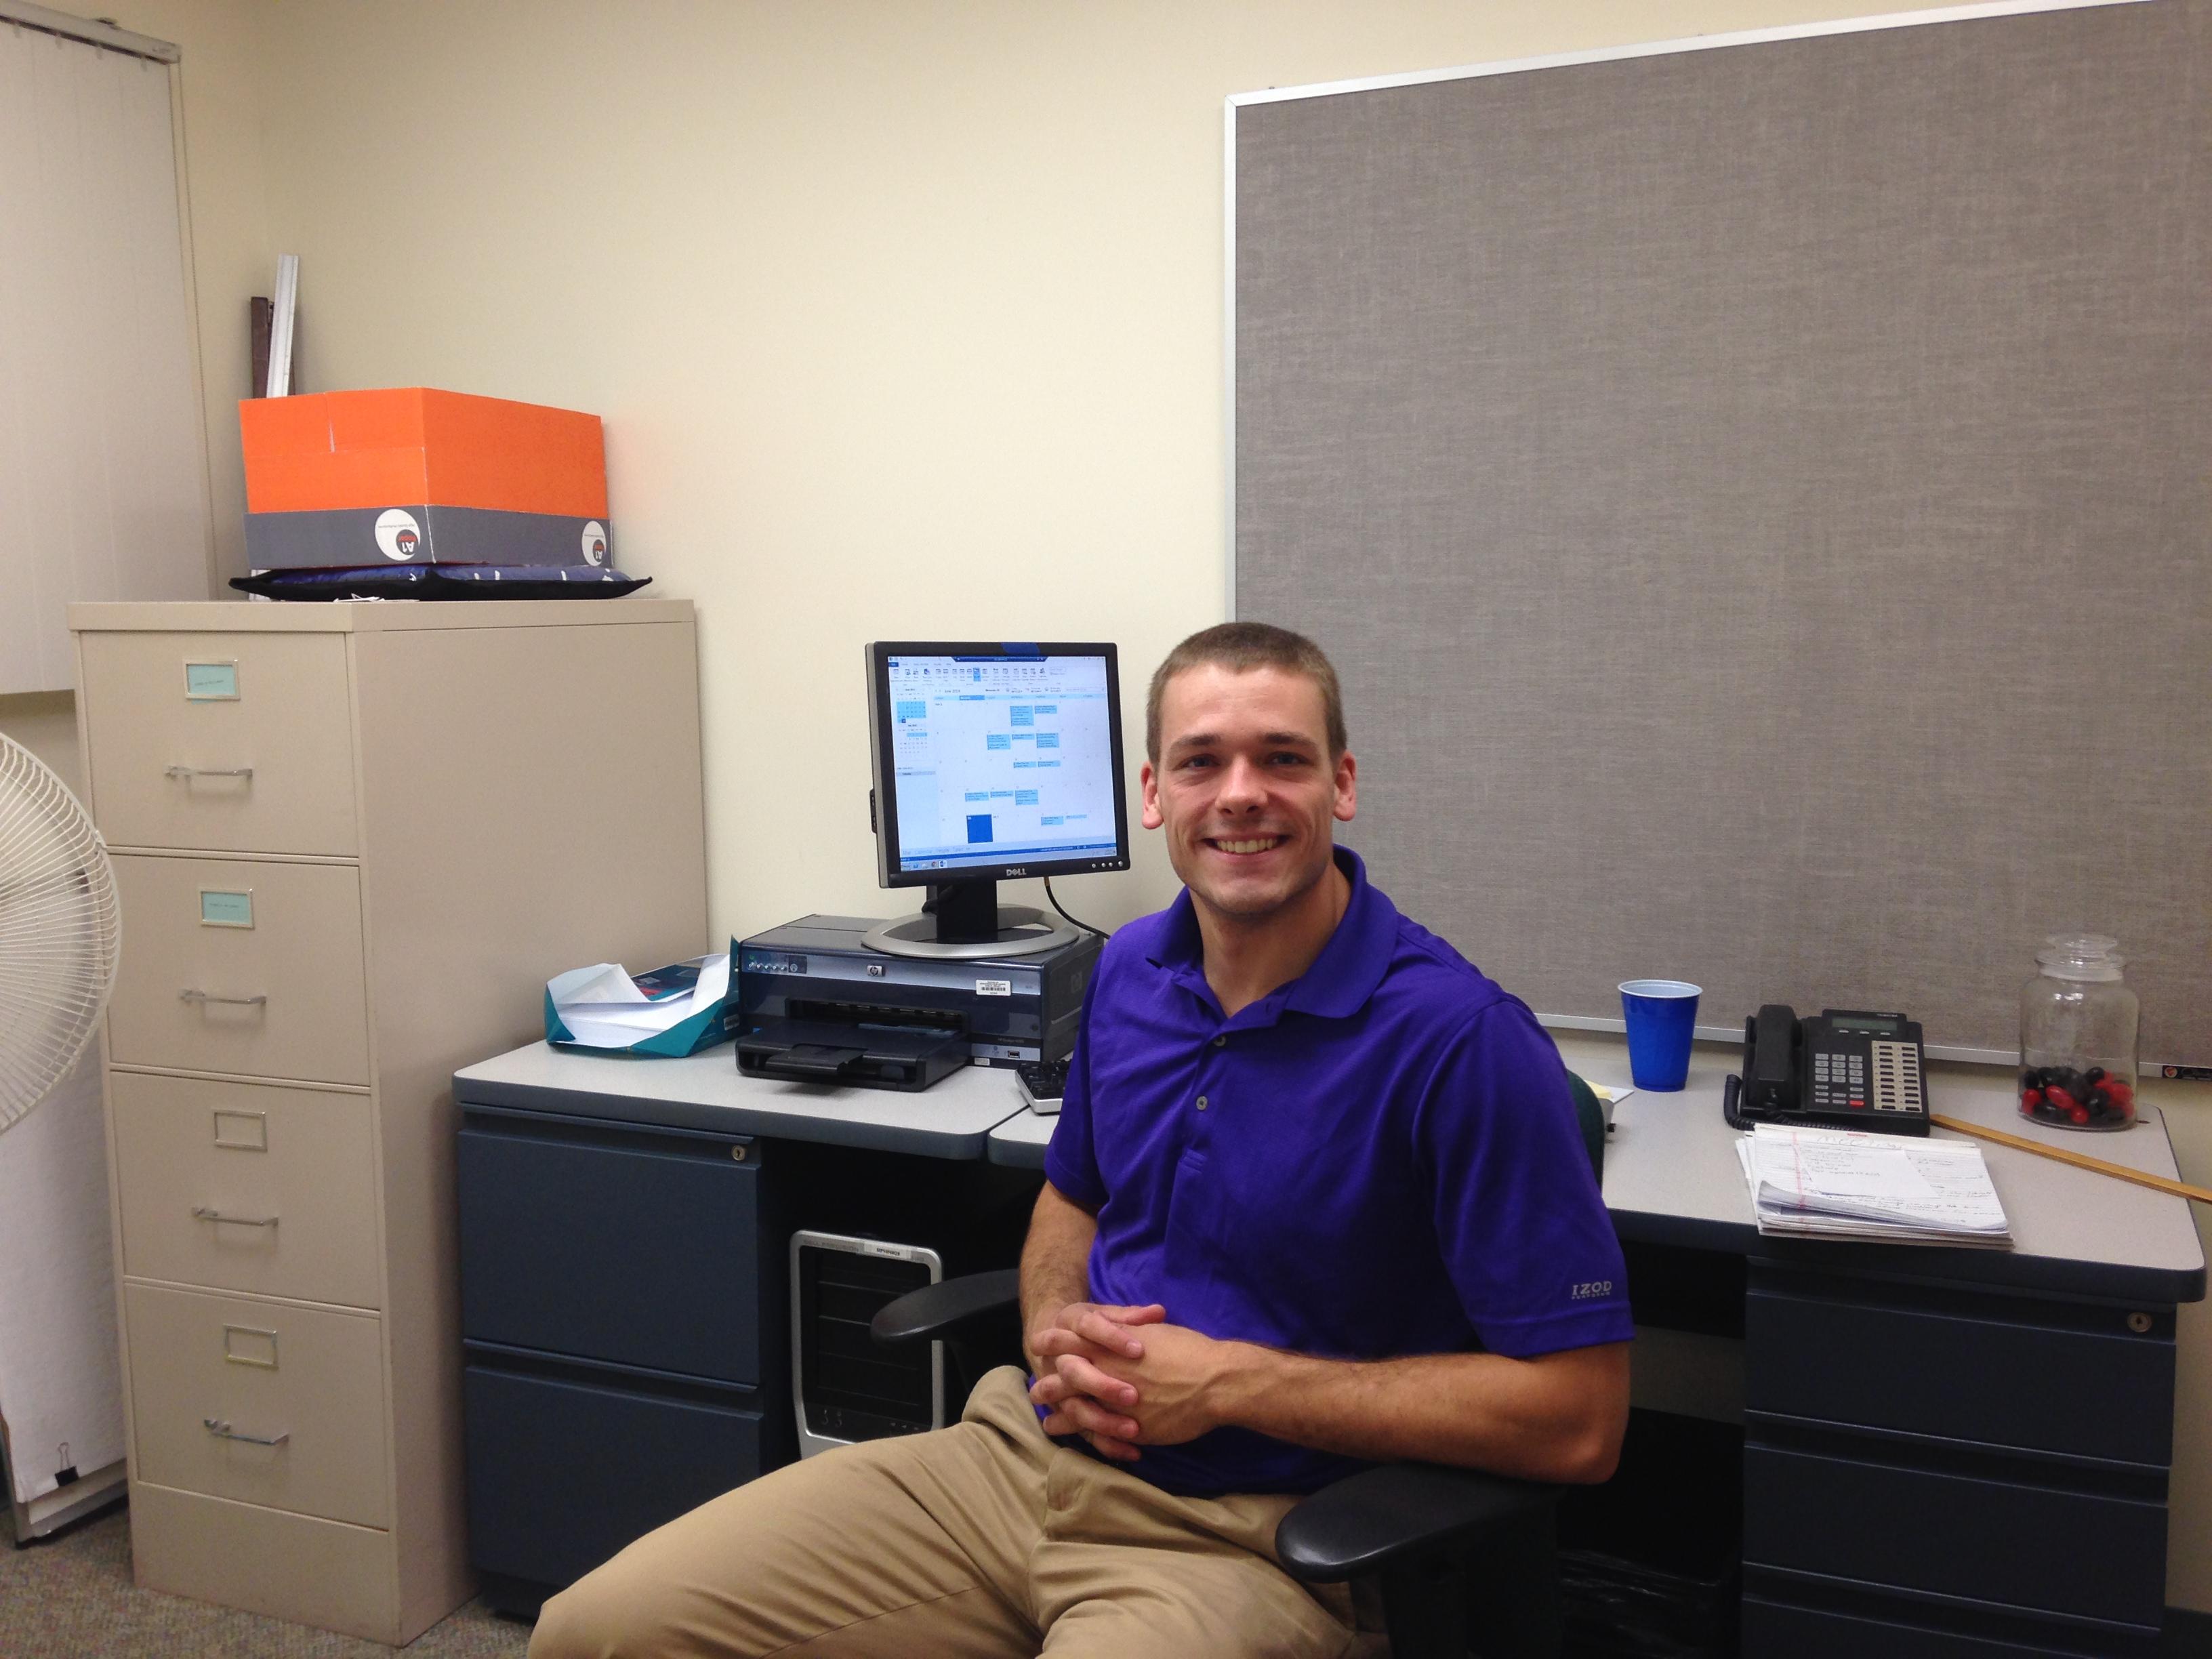 Ethan Groff Summer Internship 2014